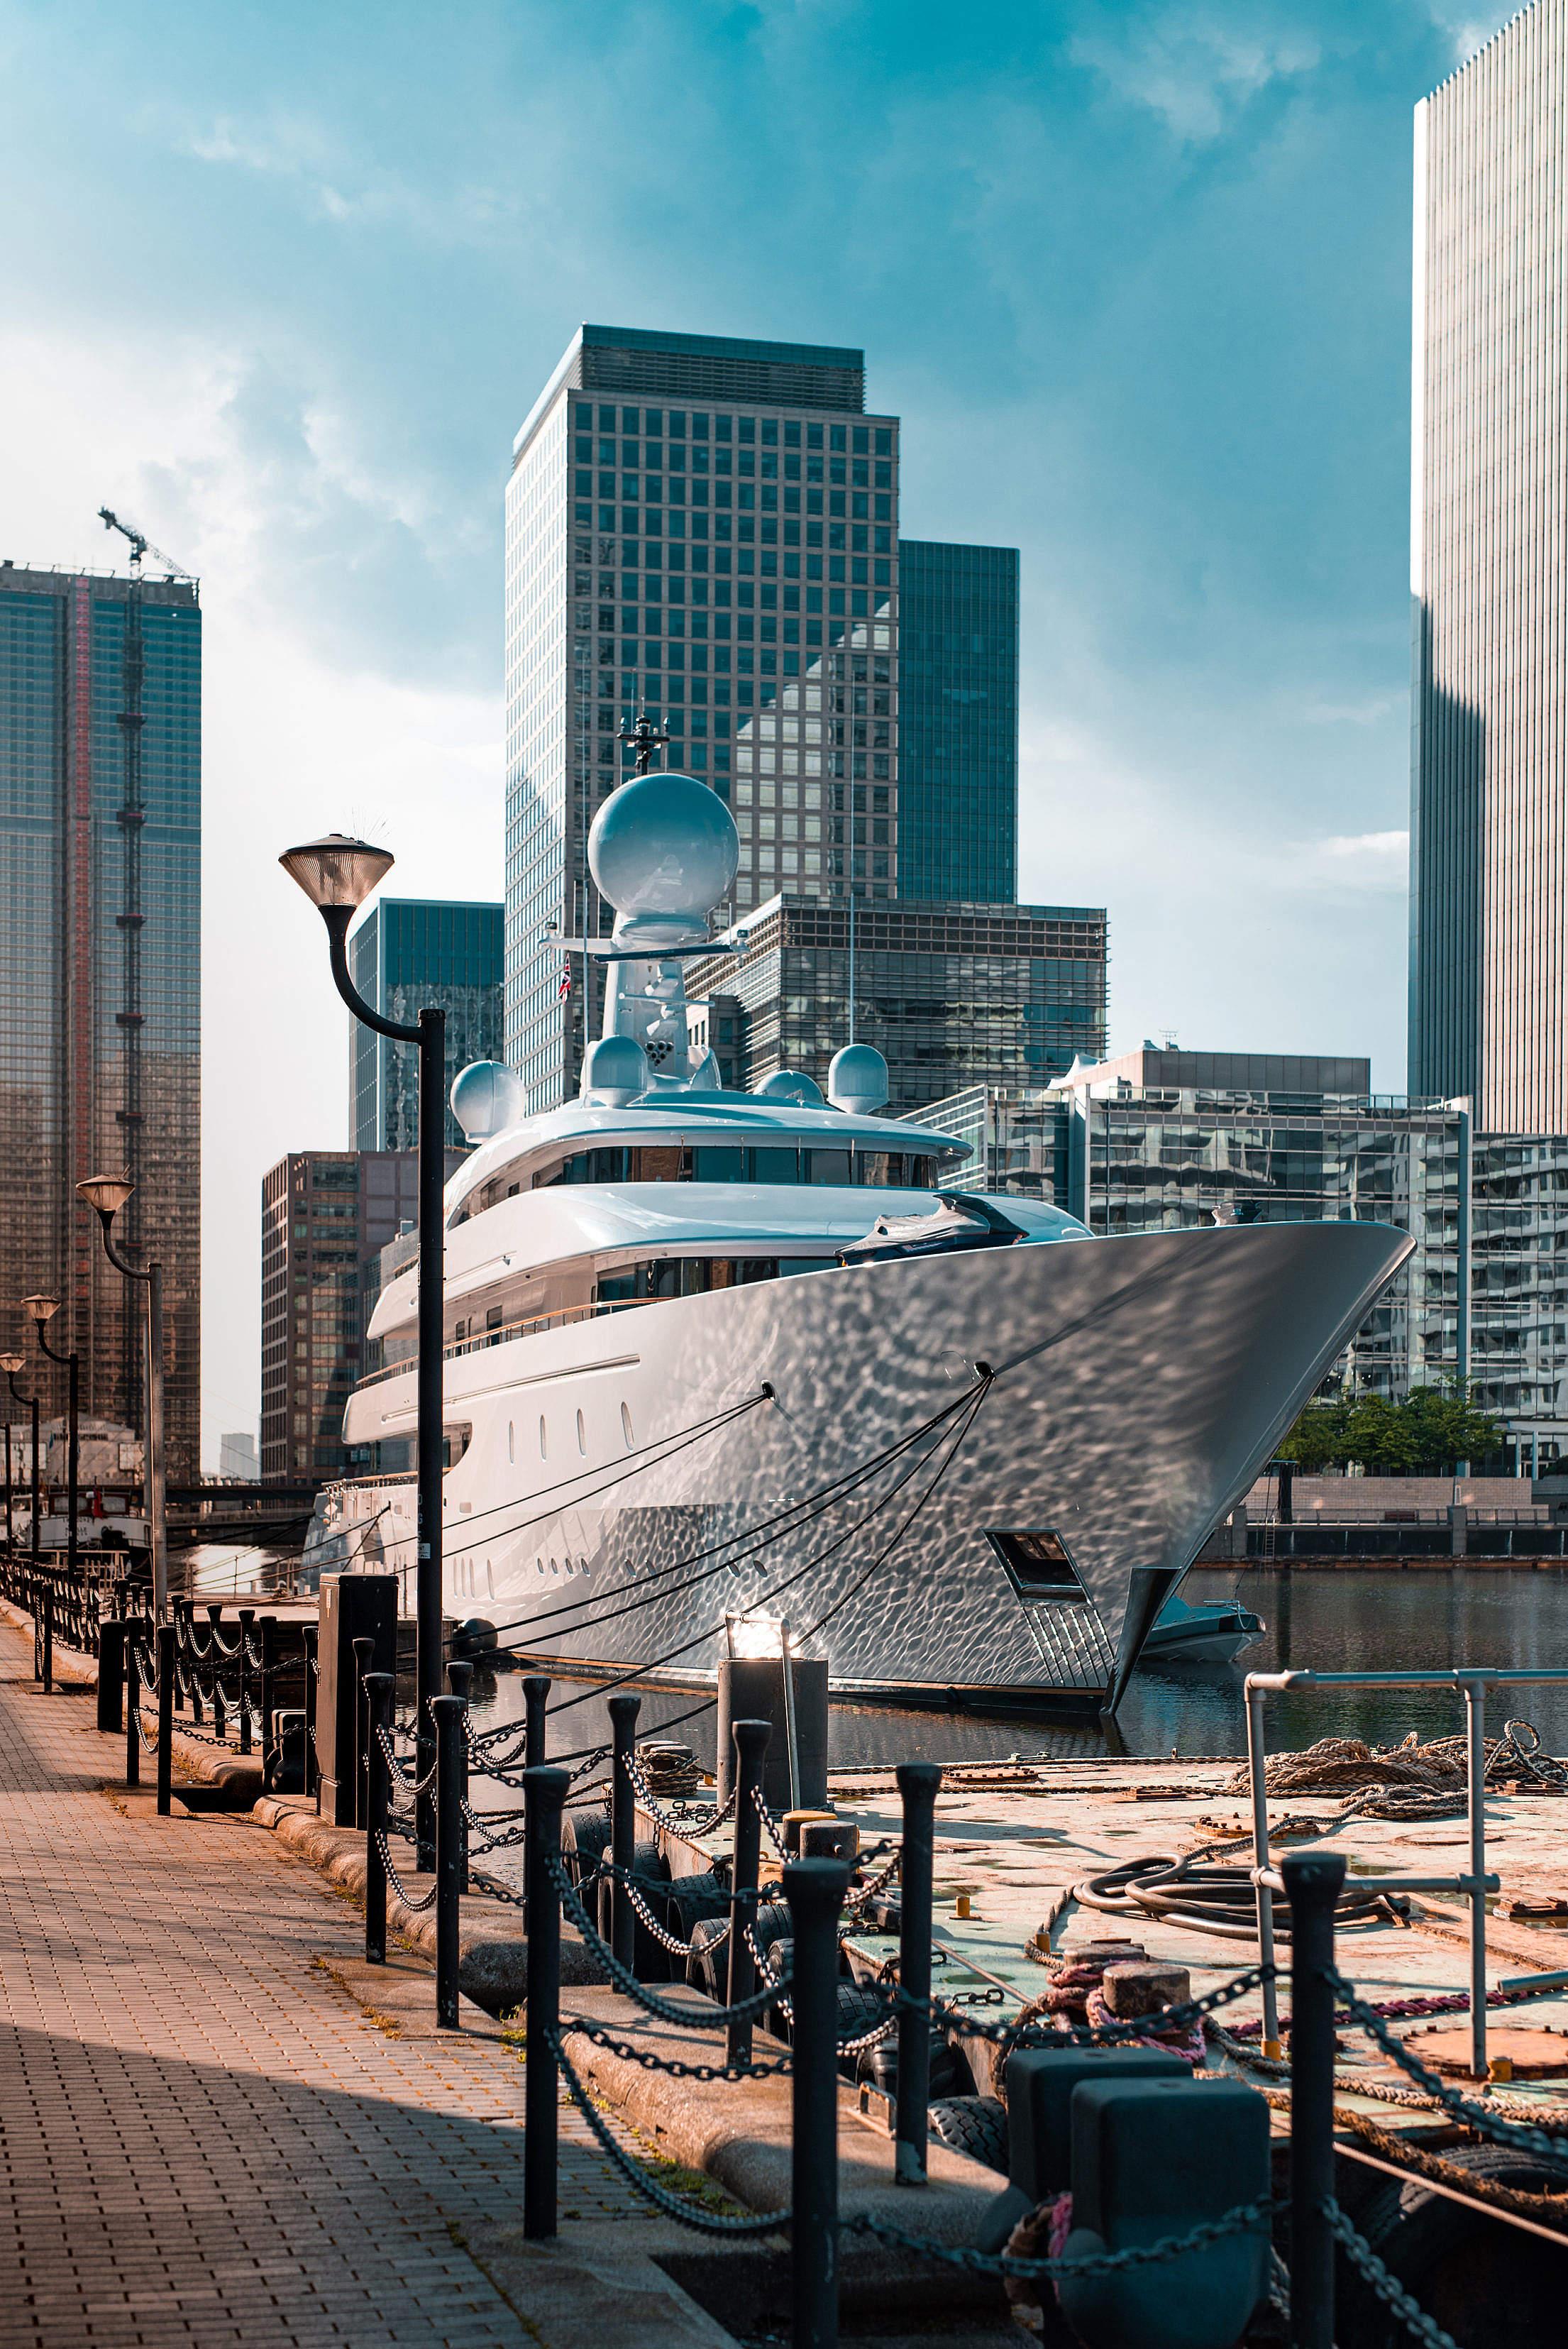 Luxury Mega Yacht in London Harbor Free Stock Photo